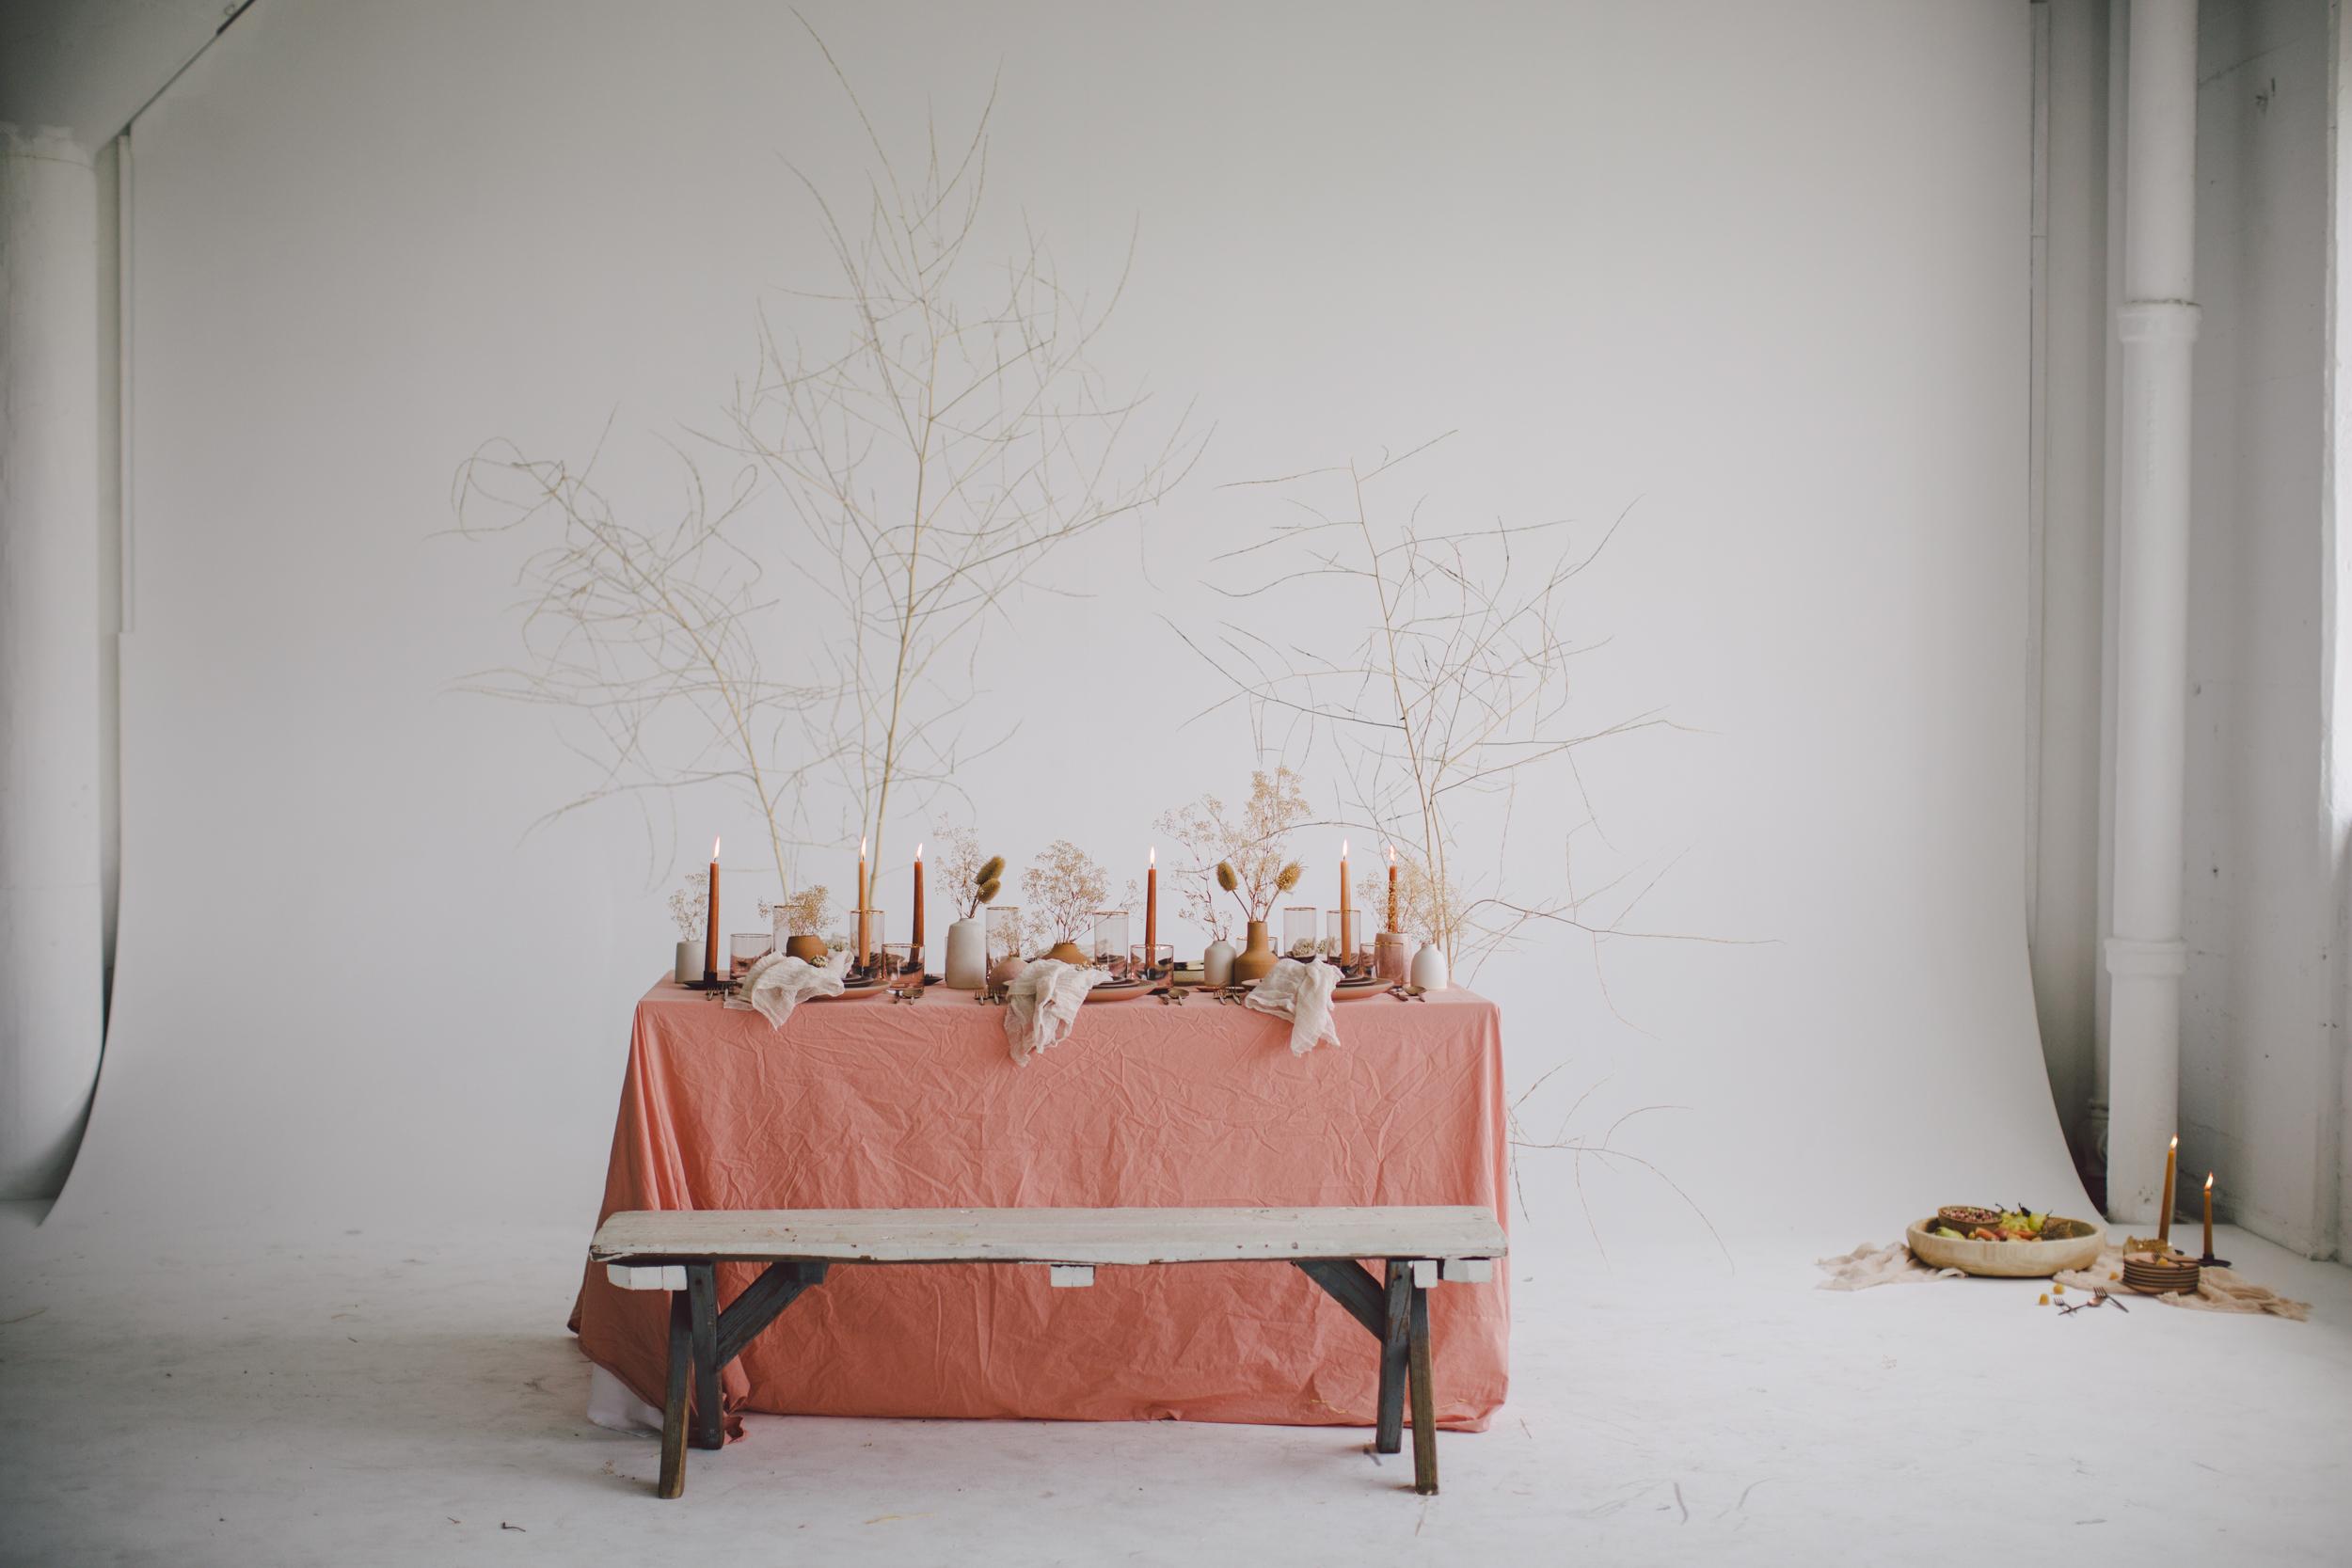 sienna table candles bohemian free spirited wedding inspiration